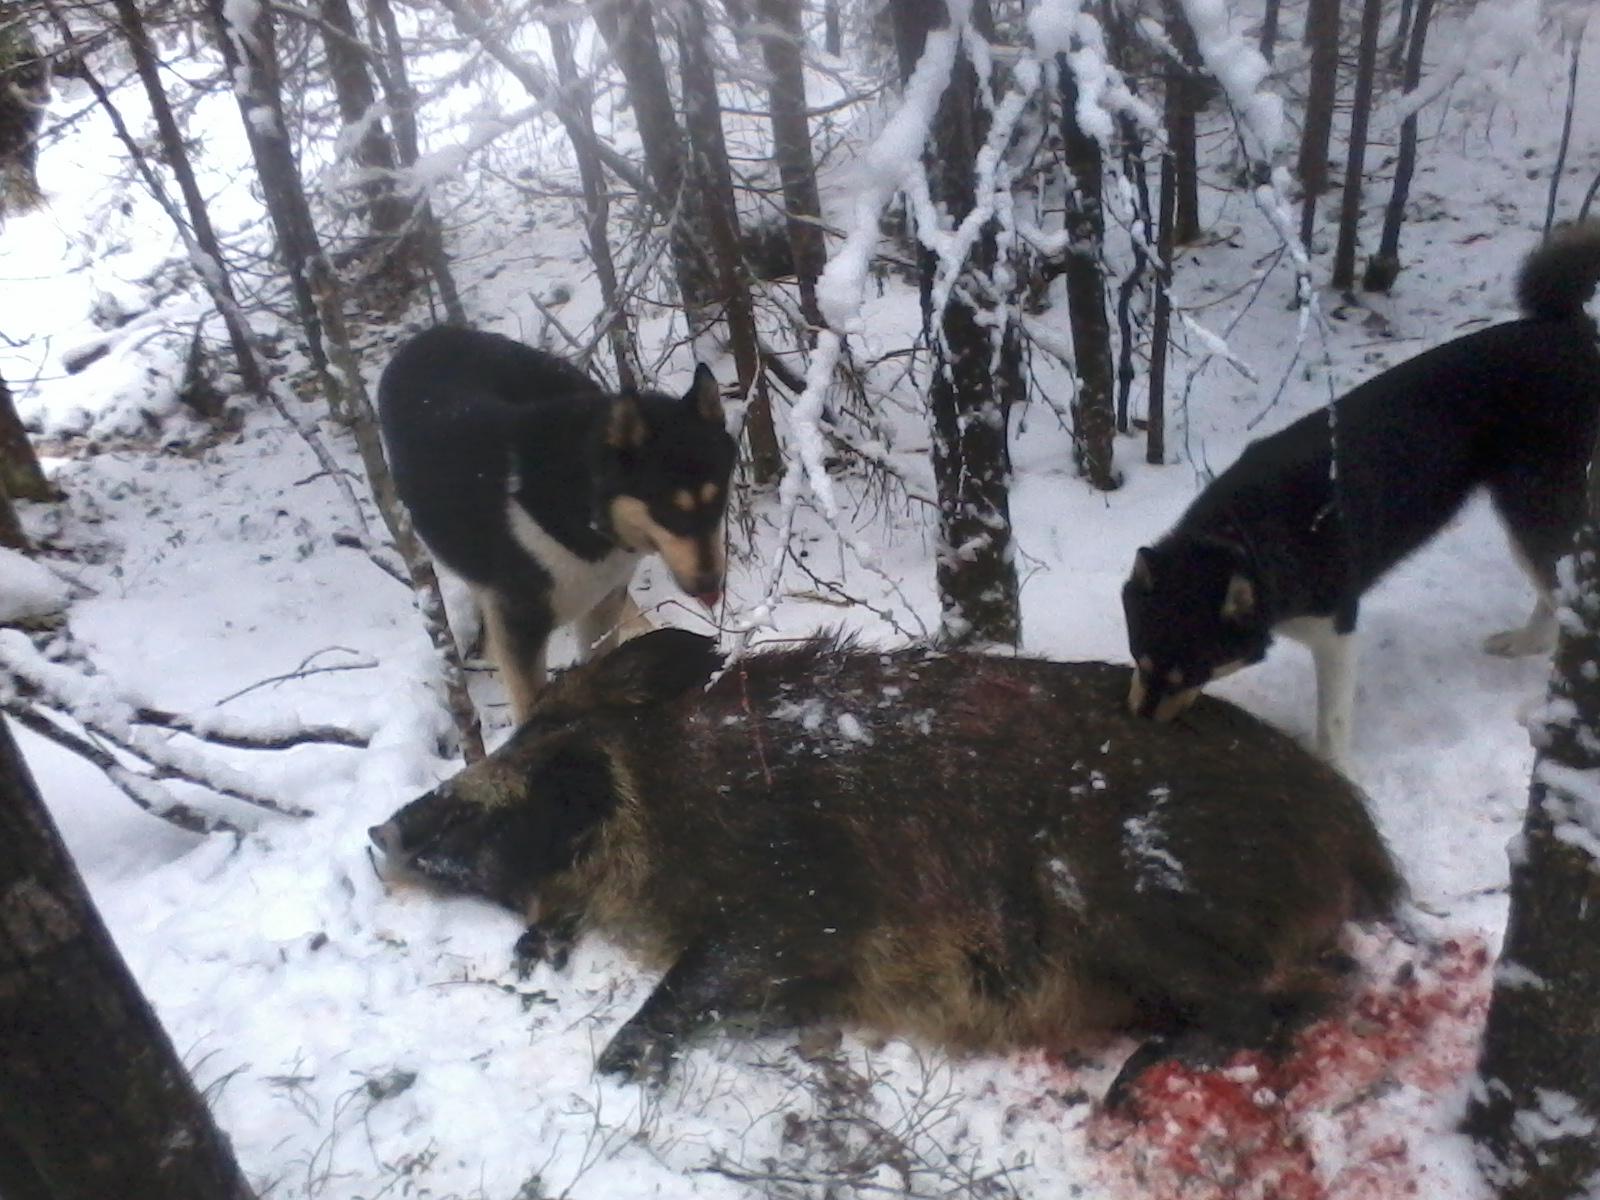 Сарма, Скиф декабрь 2013, Лен. обл.